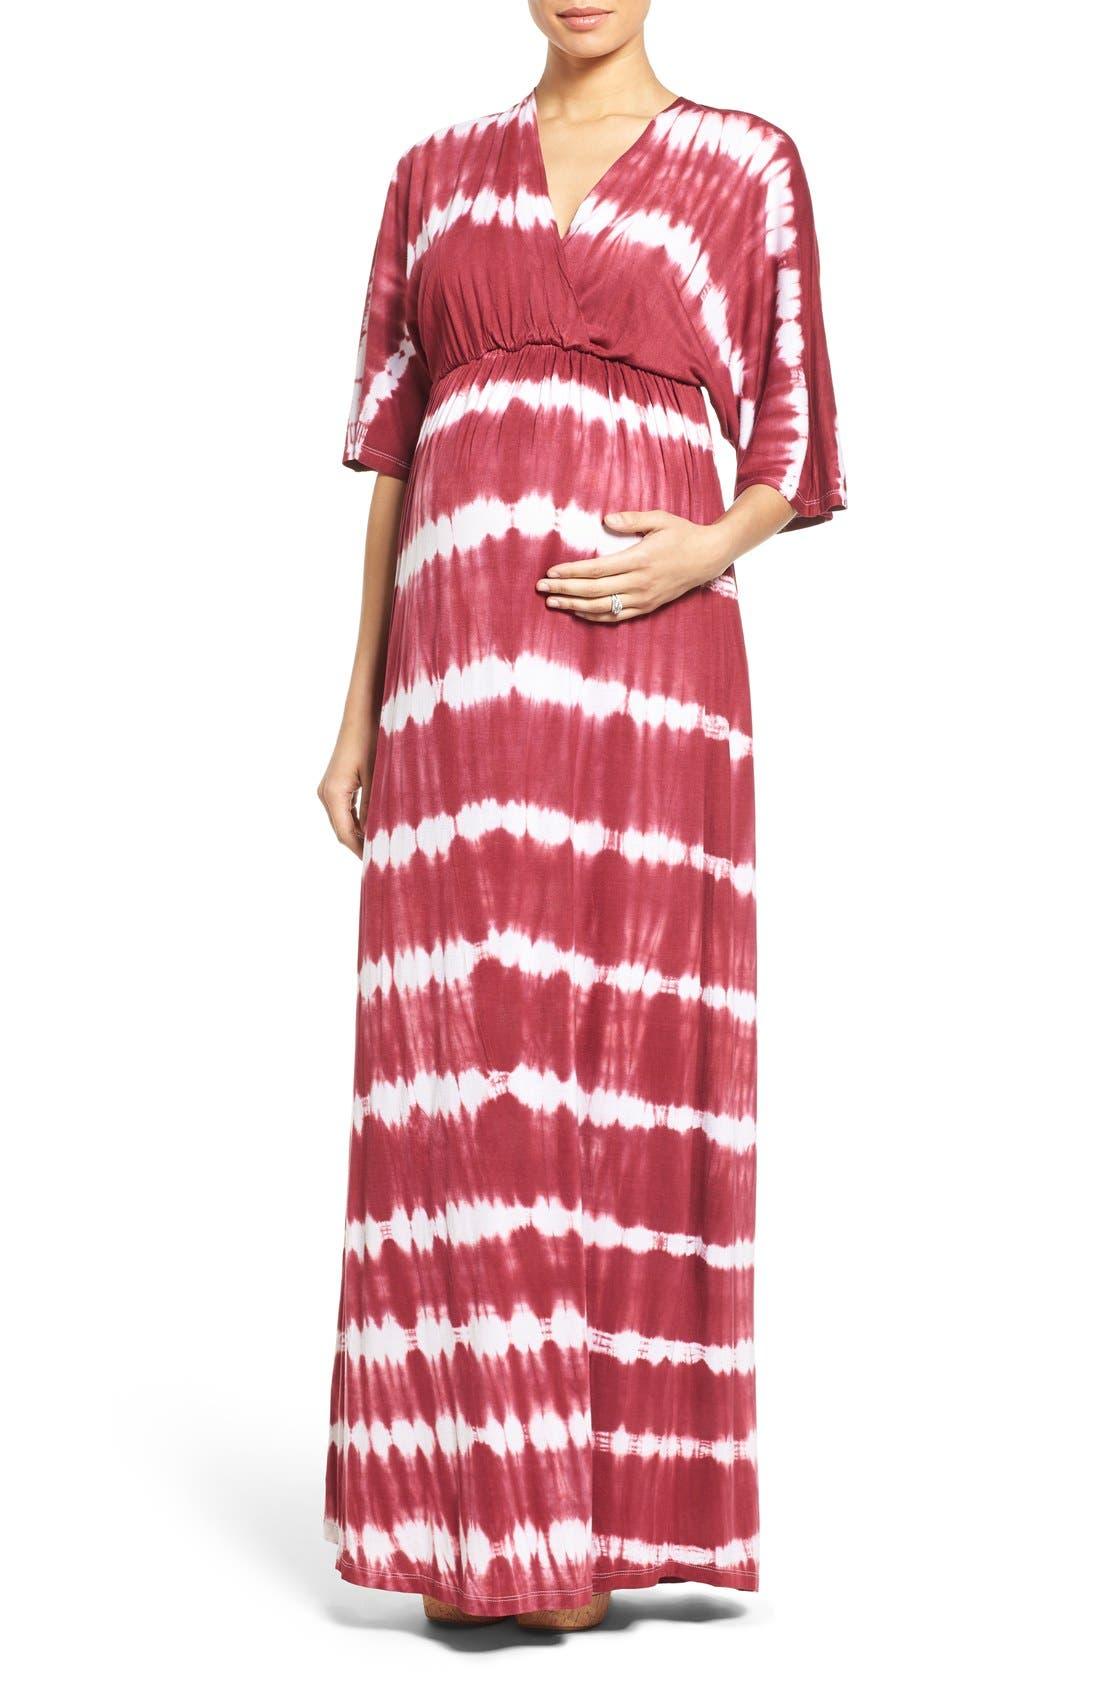 'Dream Shakey' Tie Dye Maternity Maxi Dress,                             Main thumbnail 1, color,                             RASPBERRY TIE DYE